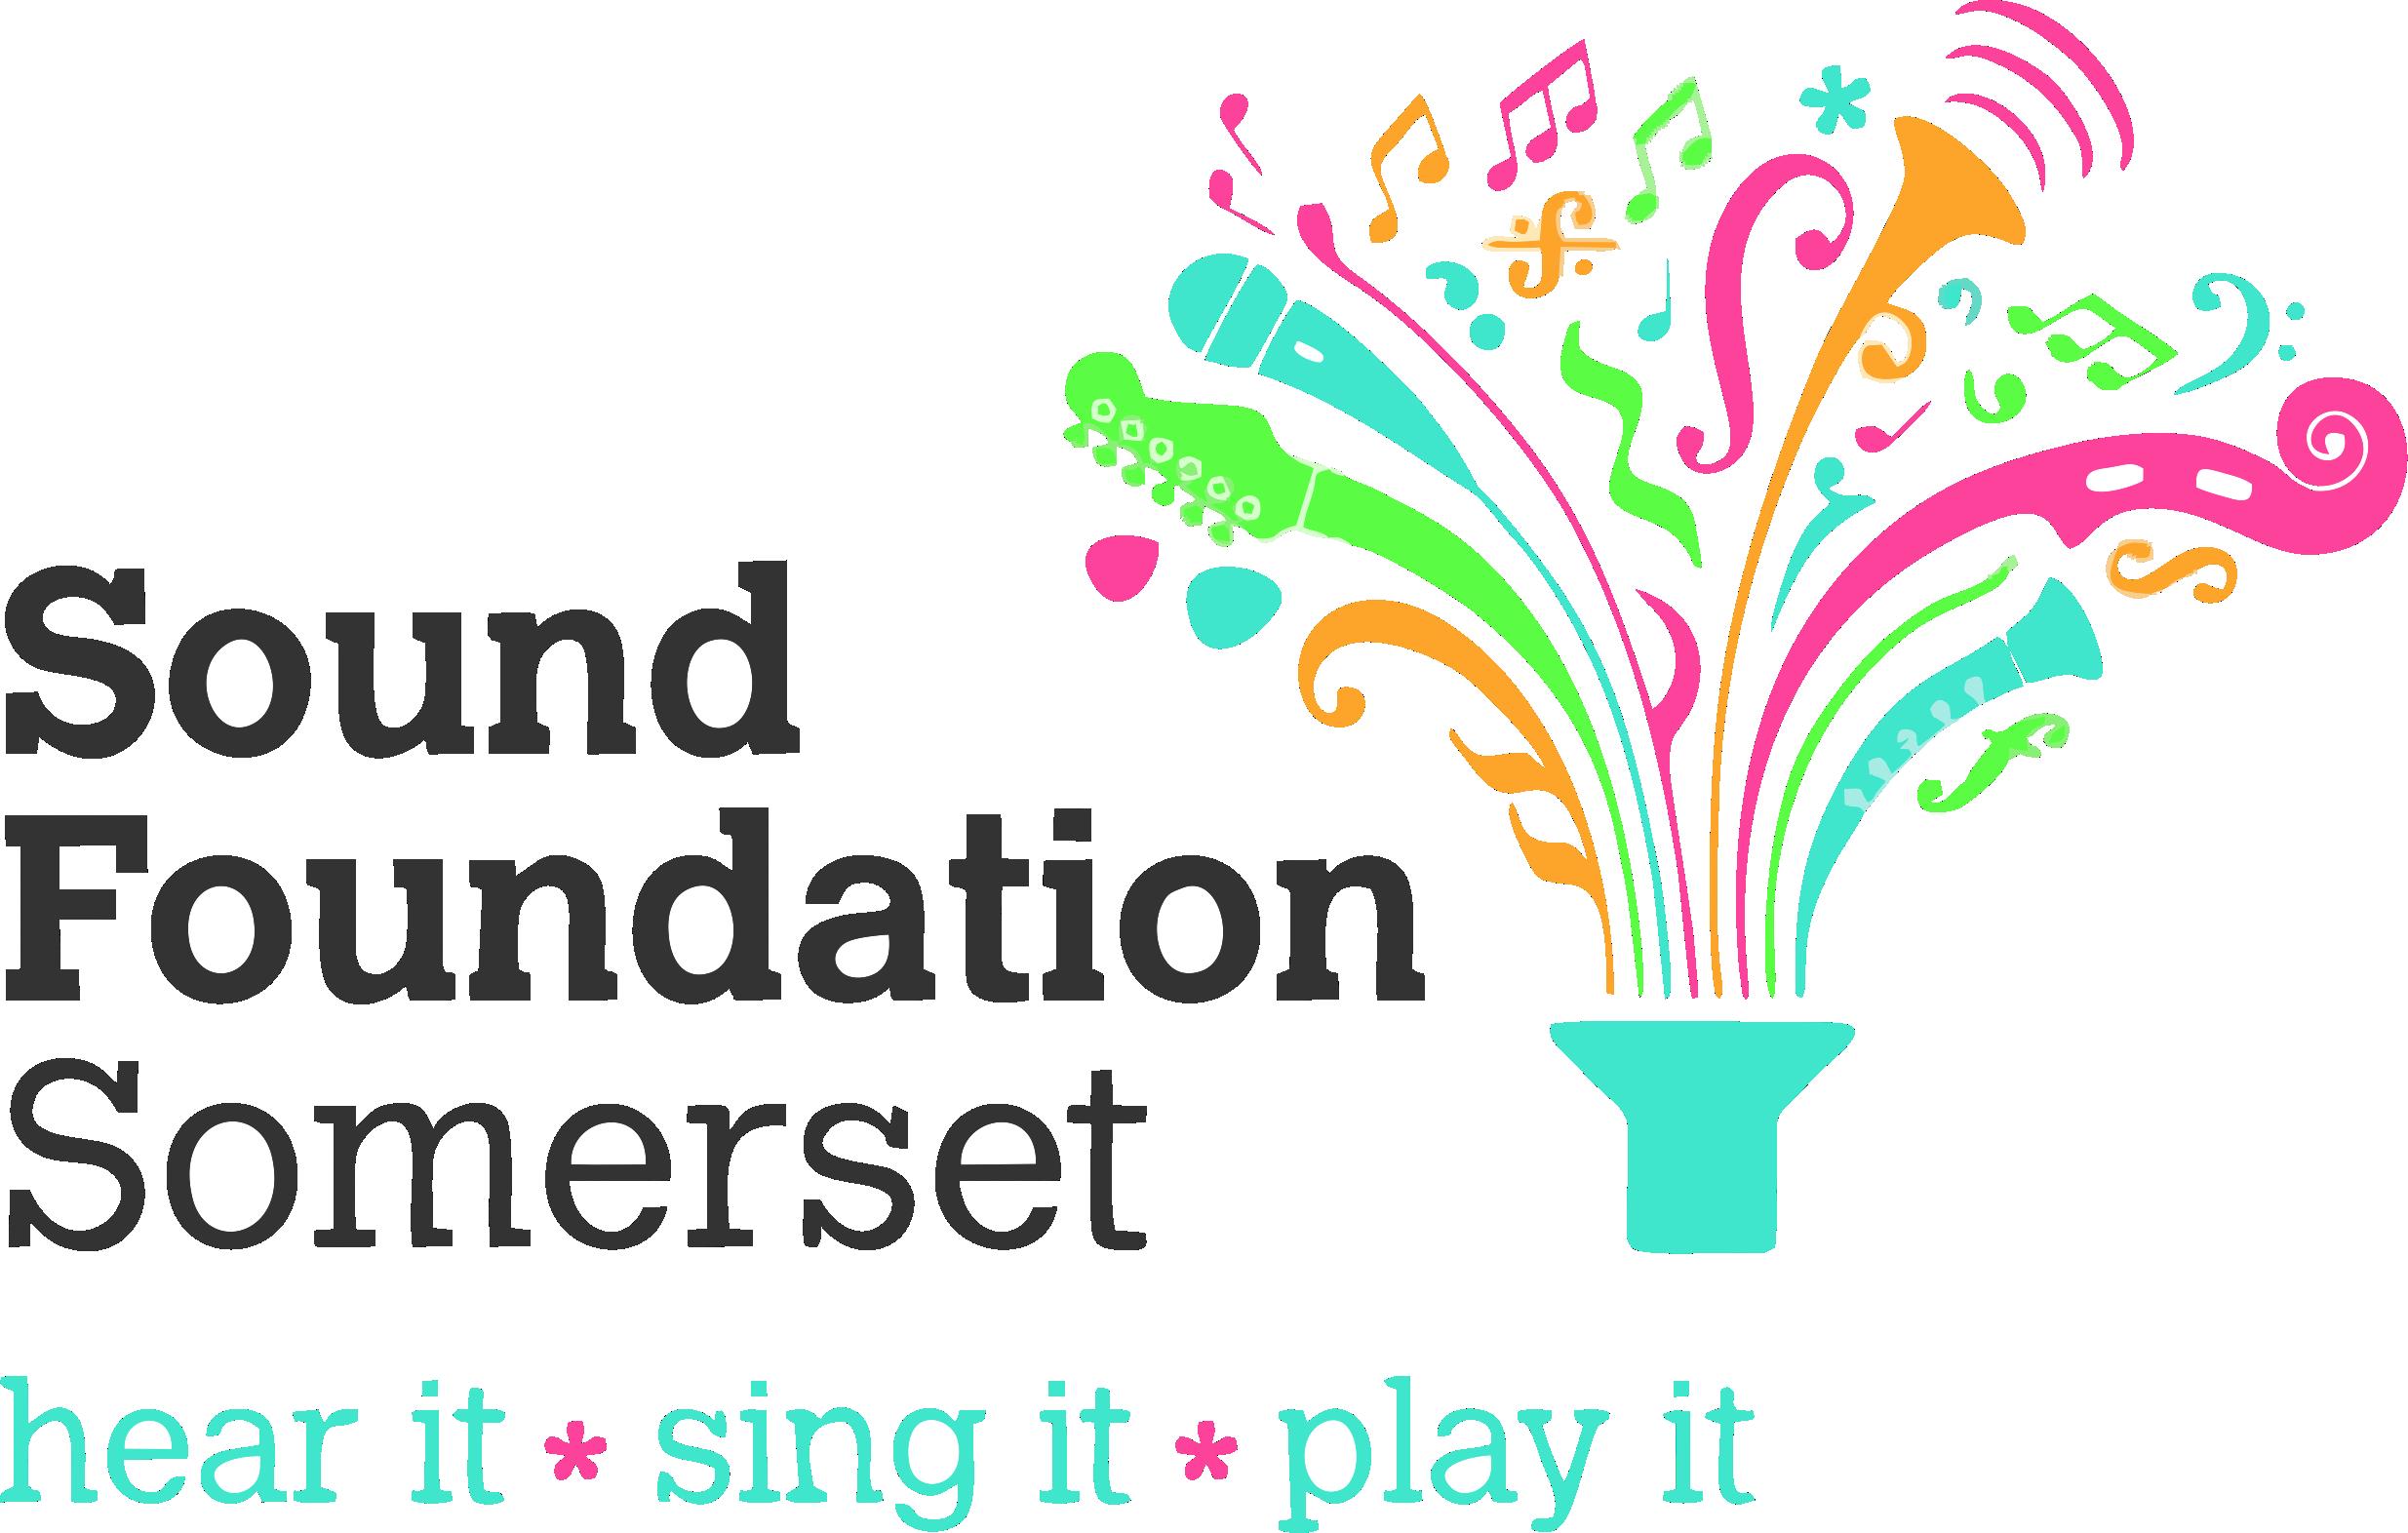 Sound Foundation Somerset